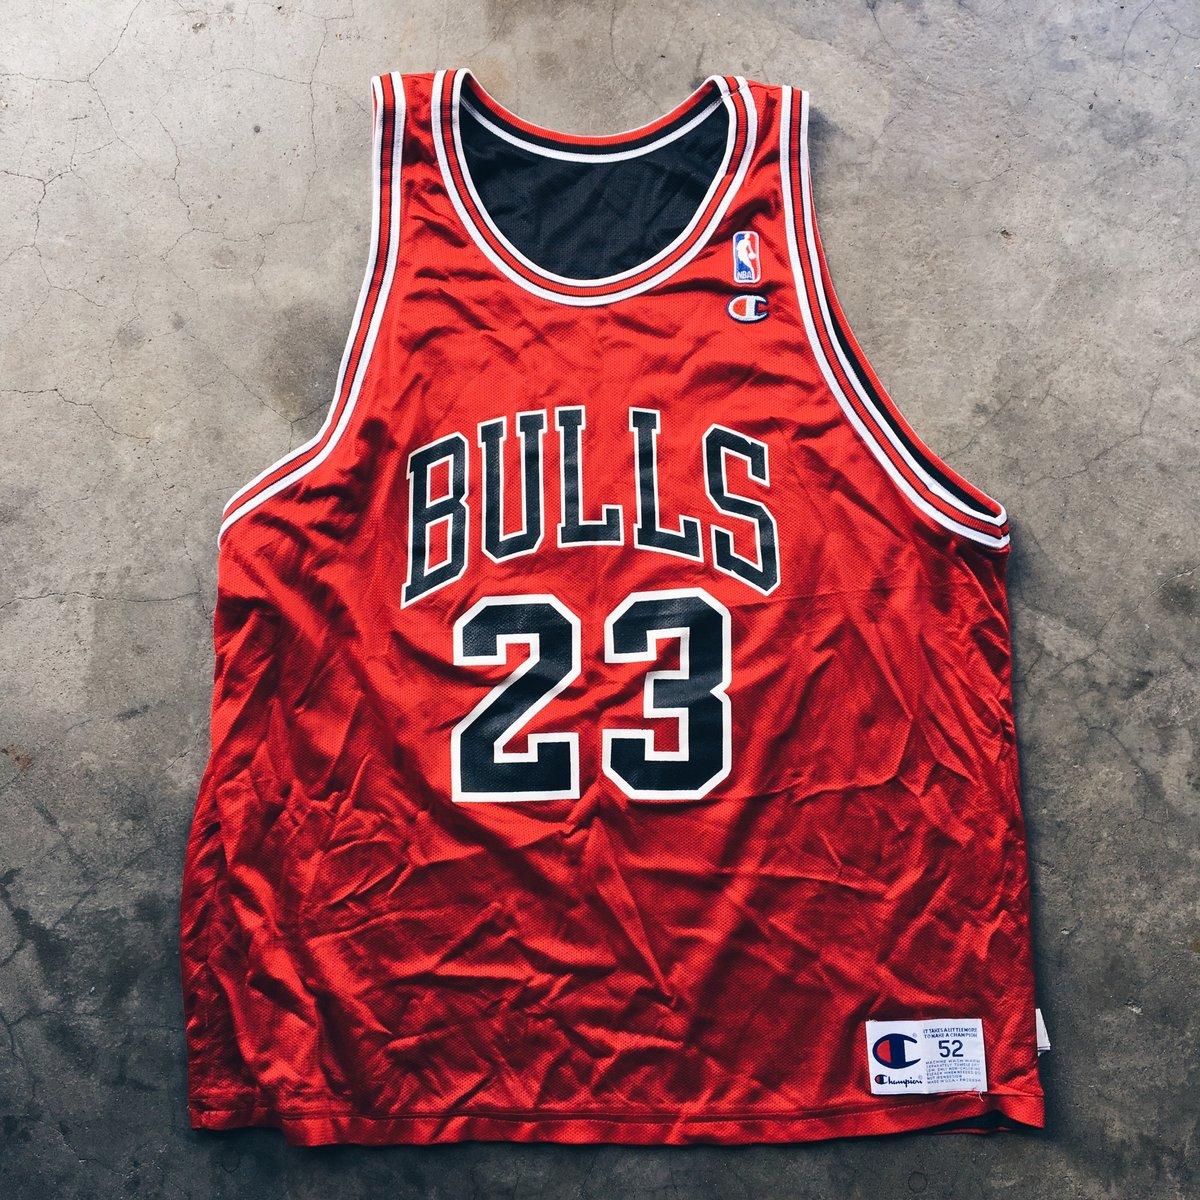 Image of Original 90's Champion MJ Reversible Jersey.